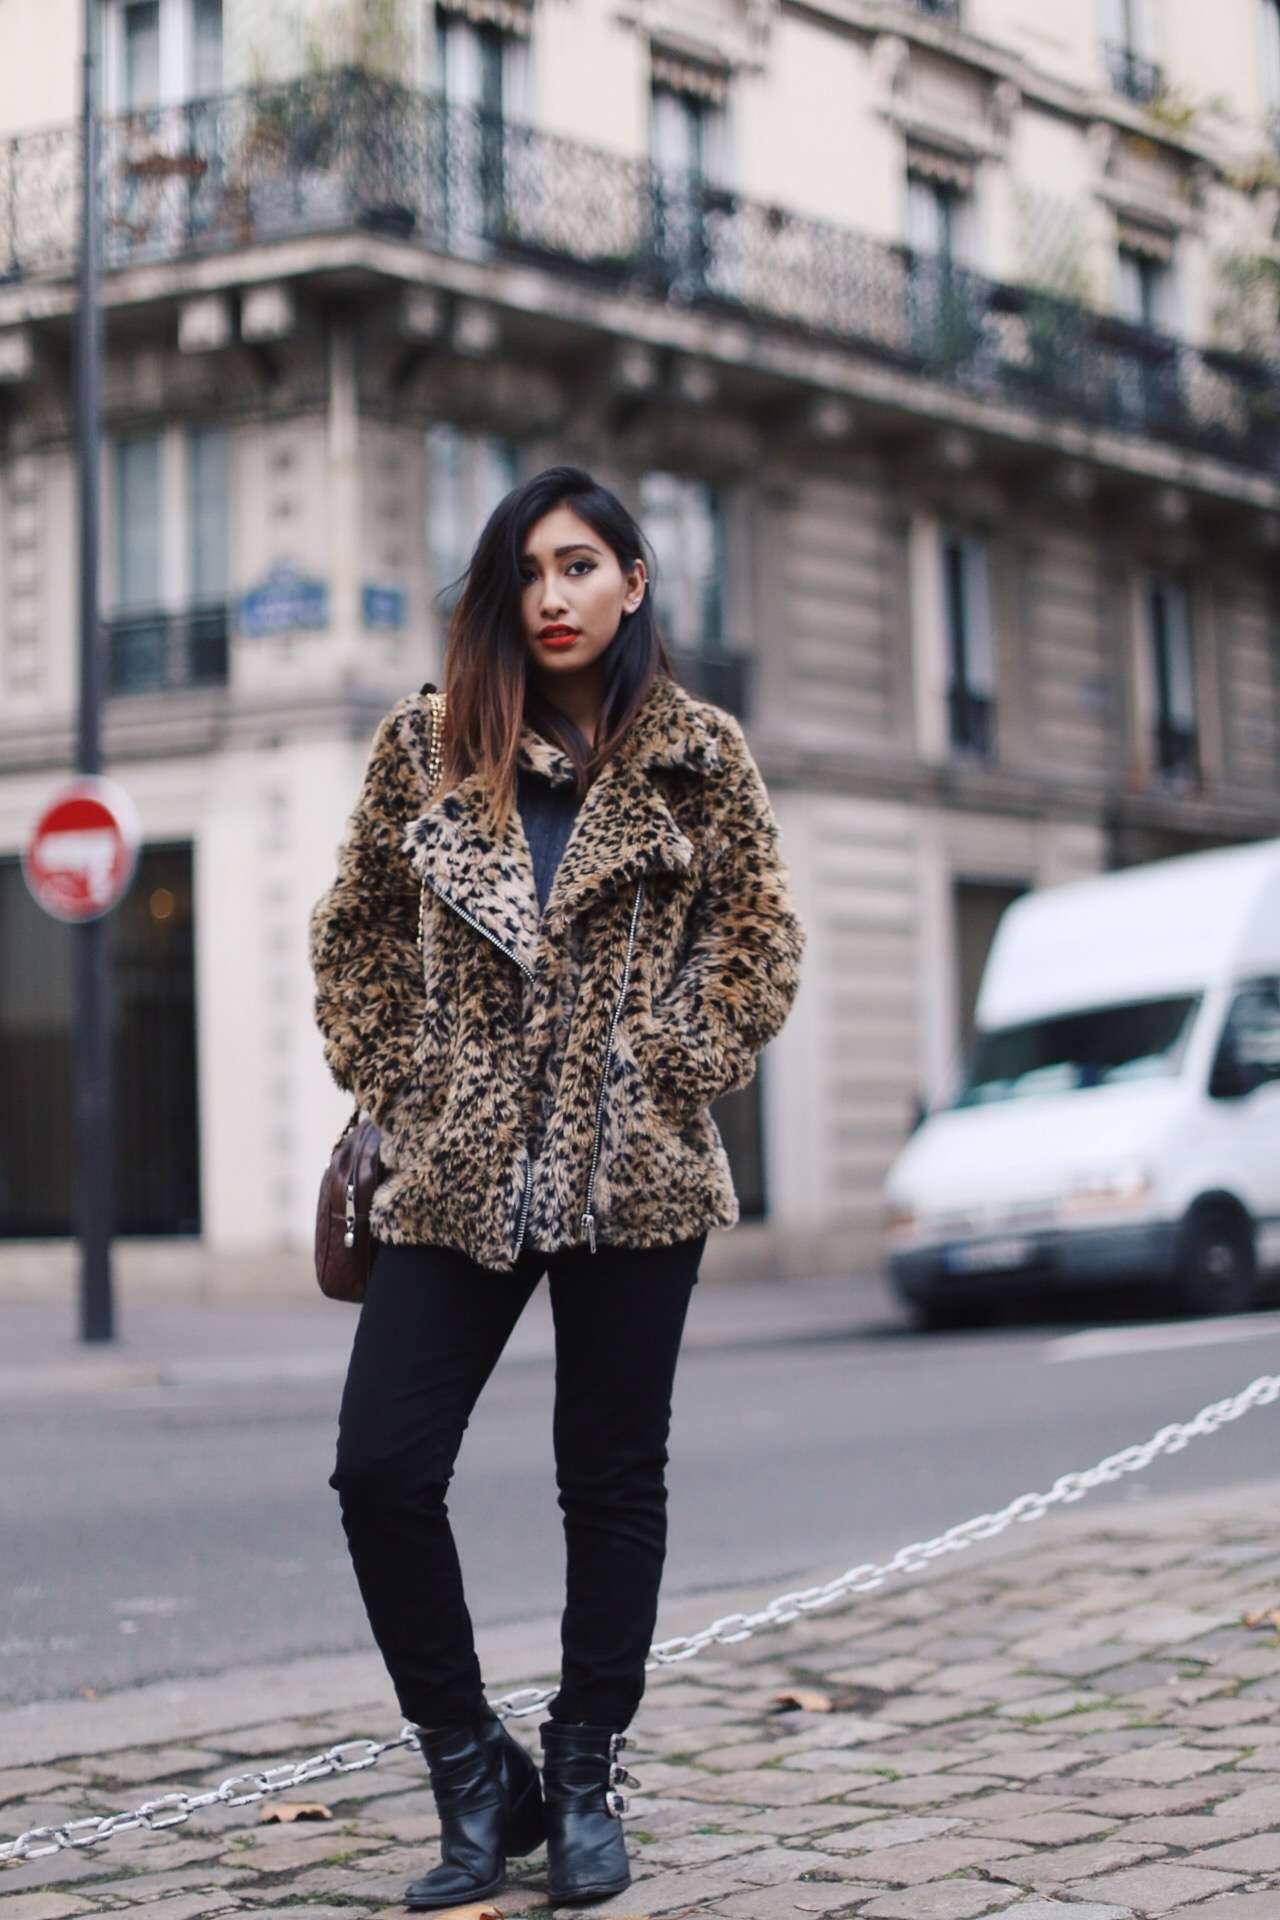 manteau femme tendance style perfecto